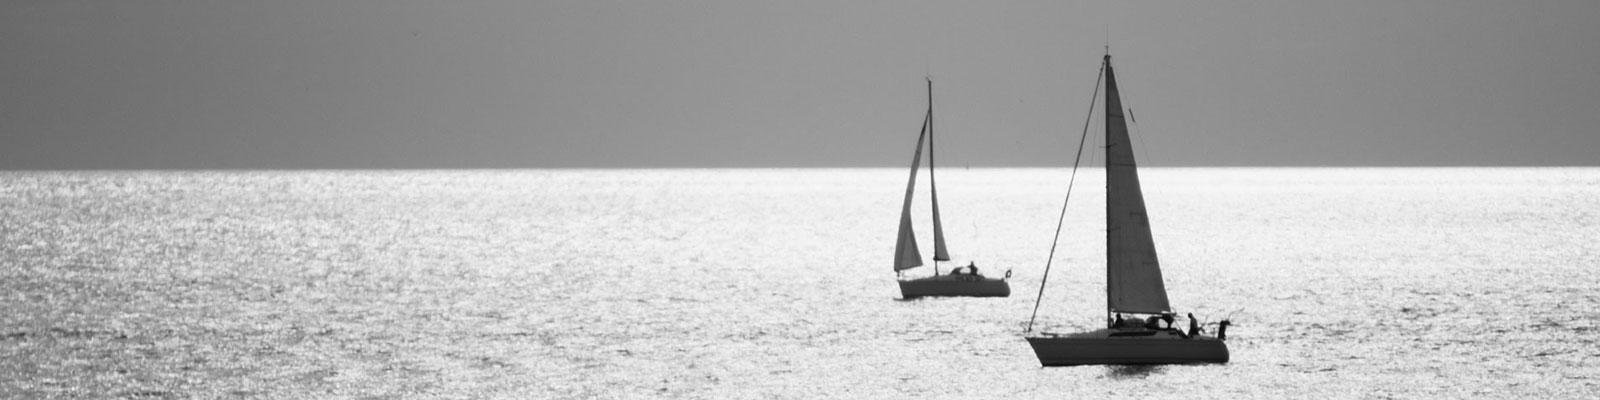 croisiere en bateau biscarrosse